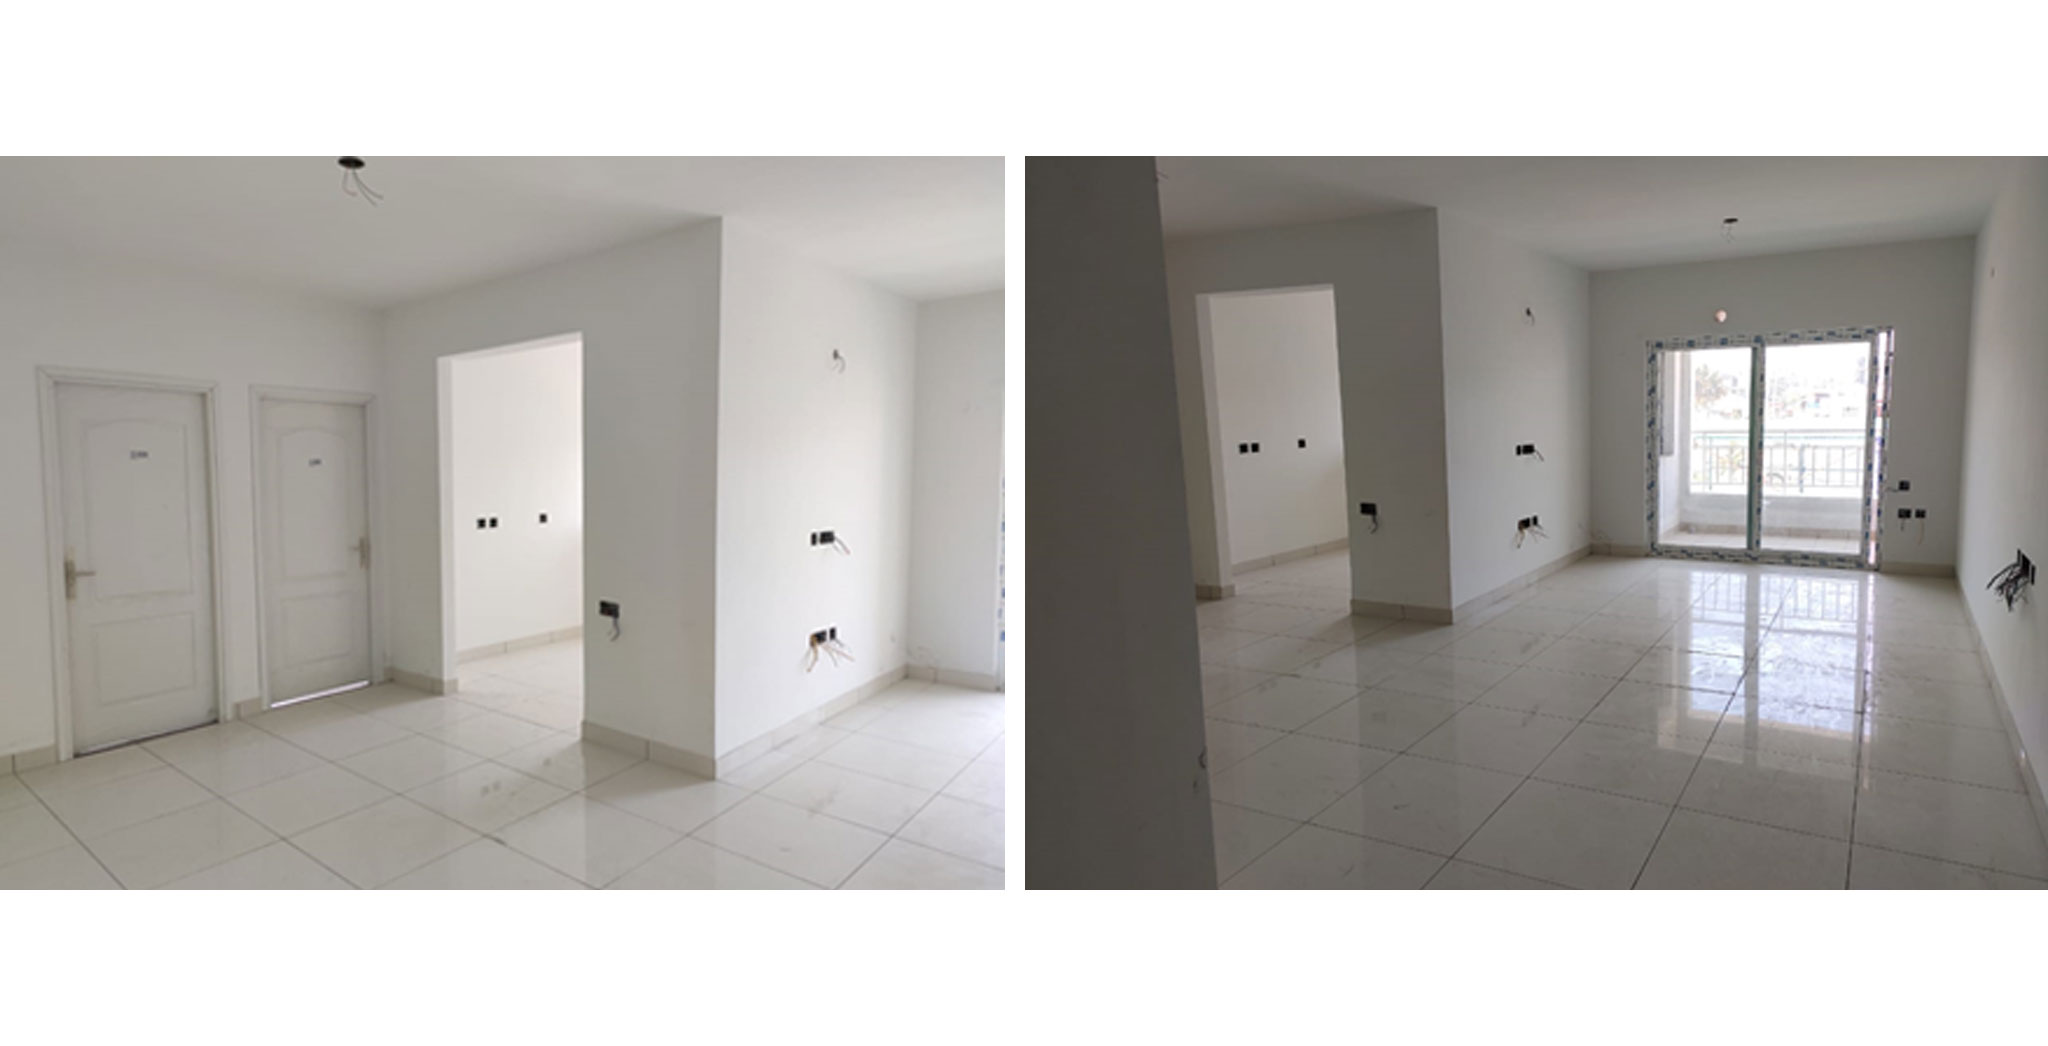 Jul 2021 - Ready for QA inspection (internal flats)